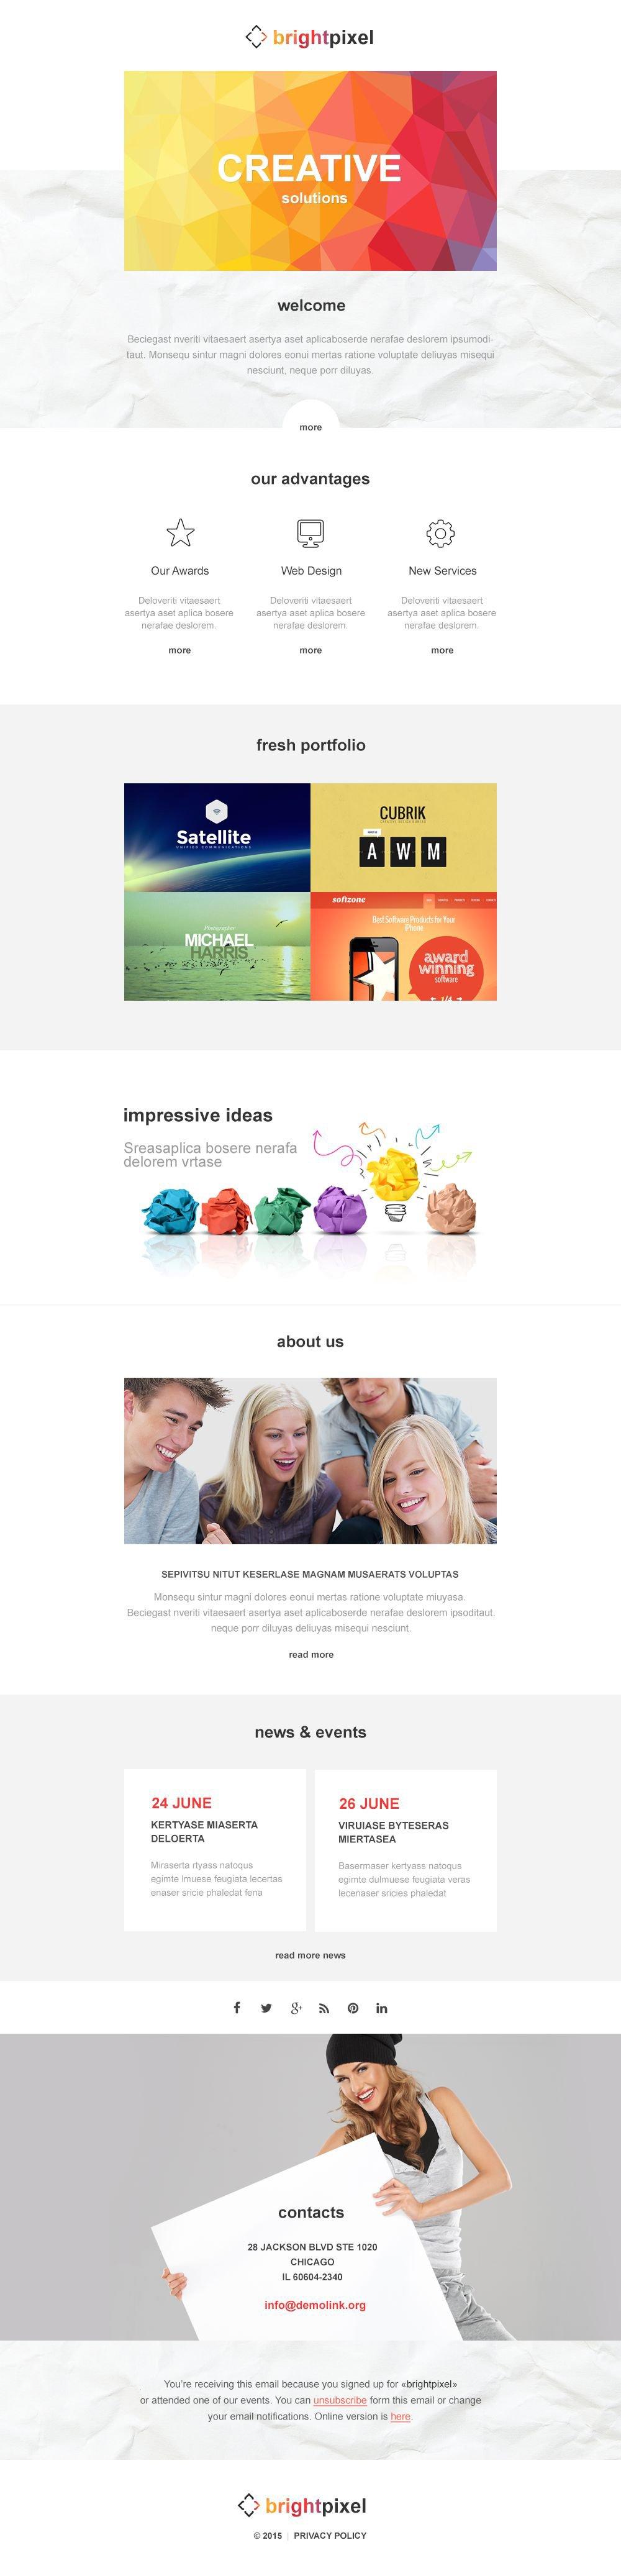 Design Studio Responsive Newsletter Template - screenshot